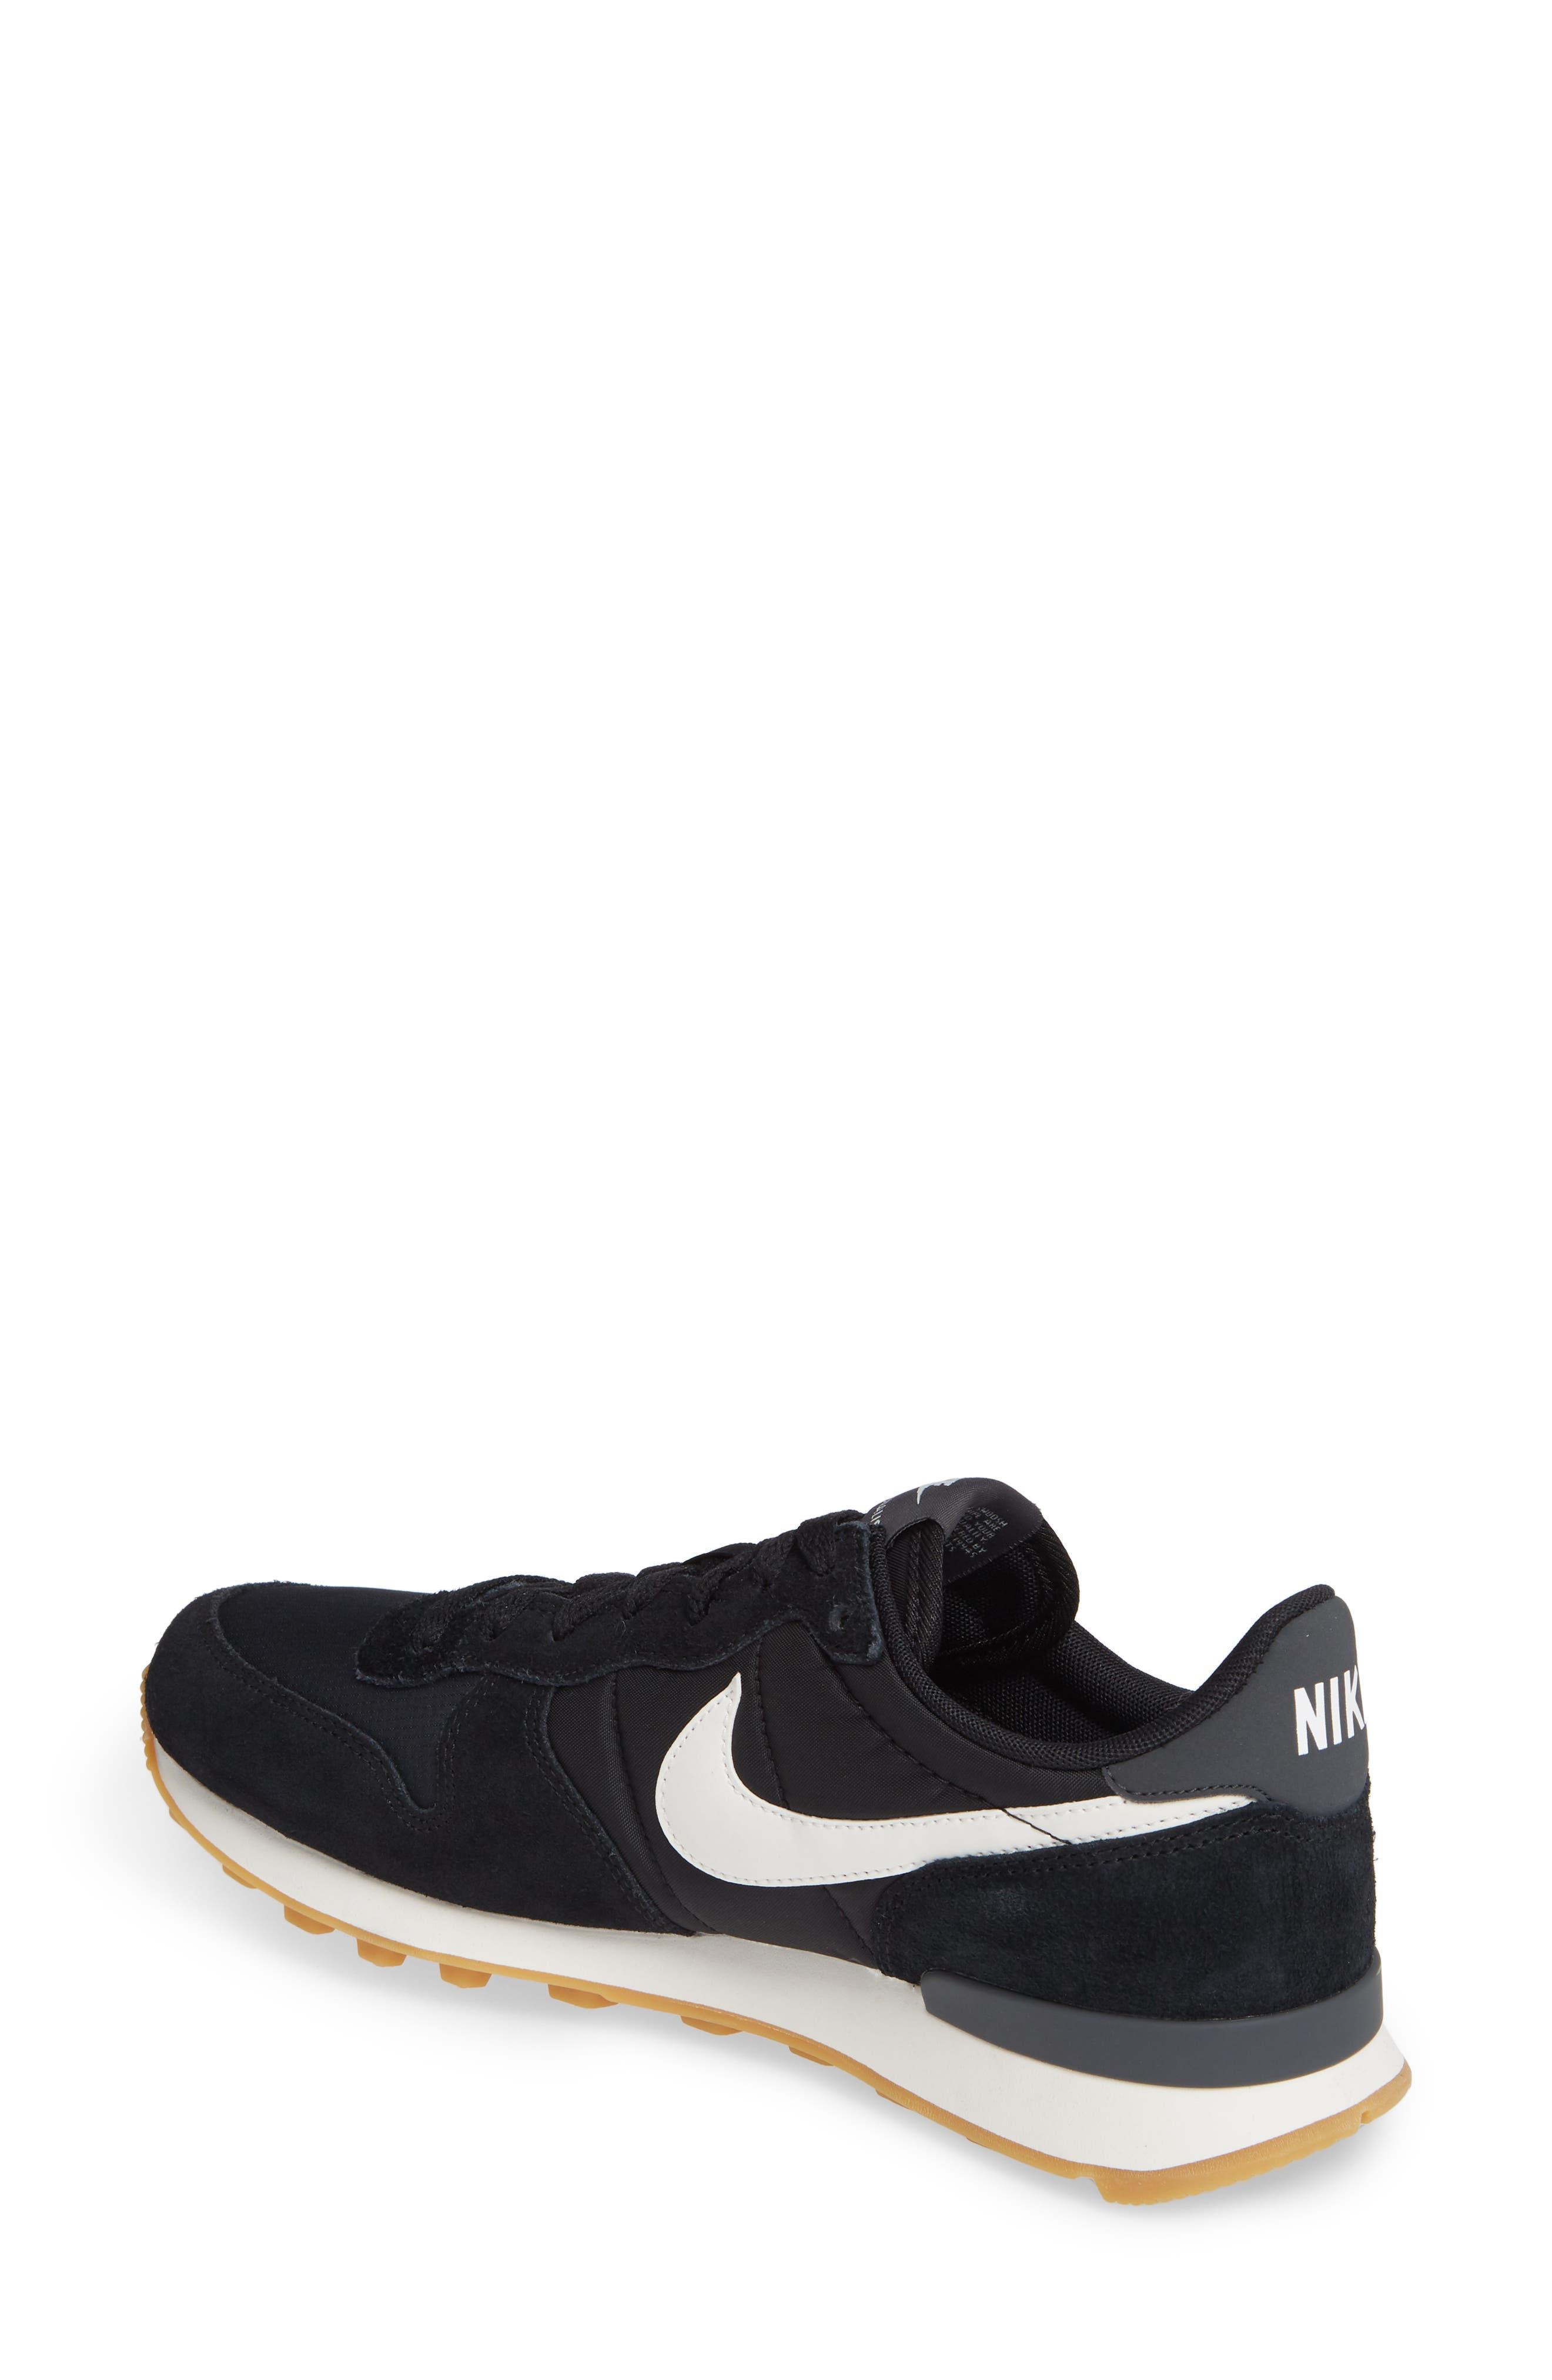 NIKE, 'Internationalist' Sneaker, Alternate thumbnail 2, color, 001